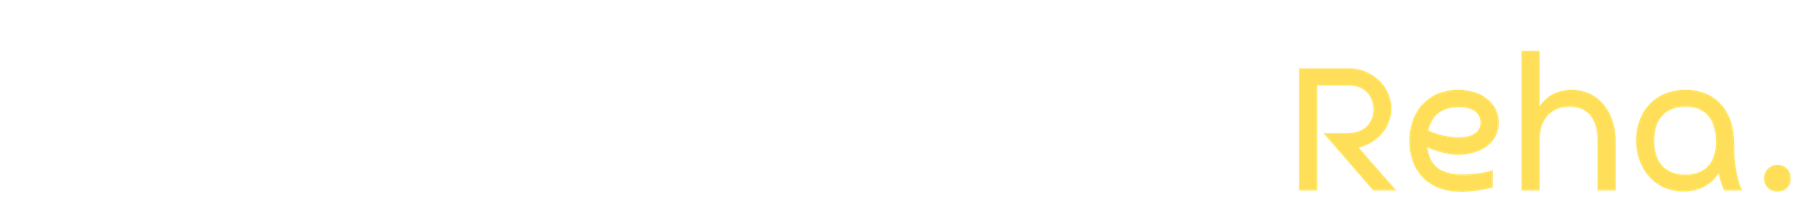 UPDRAFT Reha   沖縄 理学療法士・勉強会・求人・転職・知識・副業情報メディア【アップドラフト】